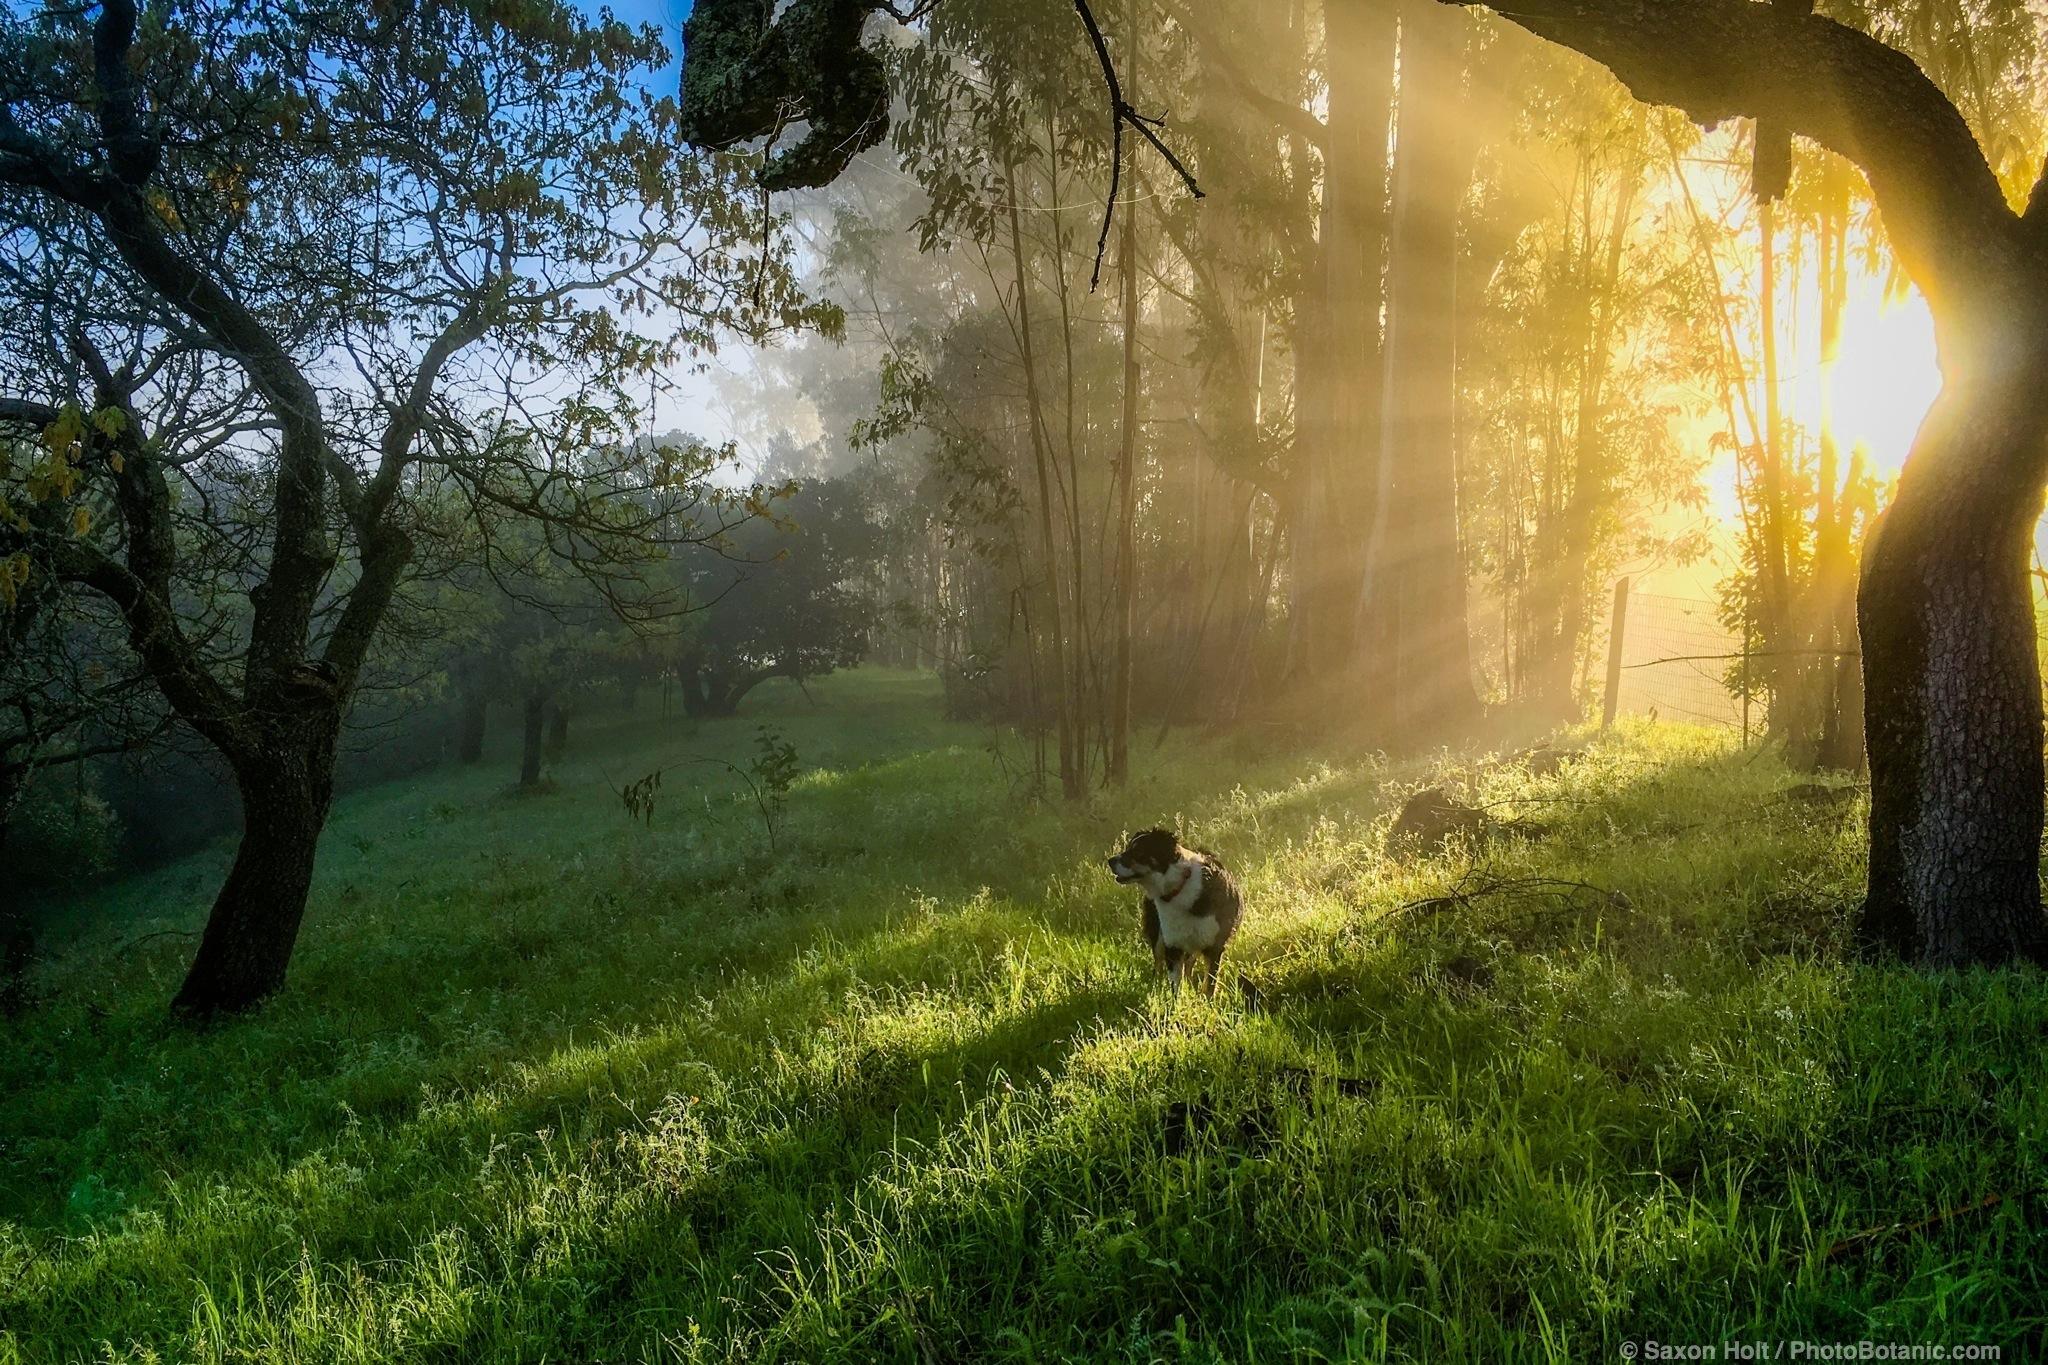 07:53:45 Lat. 38,6.8462N; Long. 122,33.582W 02/29/2016. Morning light - fog breaking in the winter green hills California. Cherry Hill.